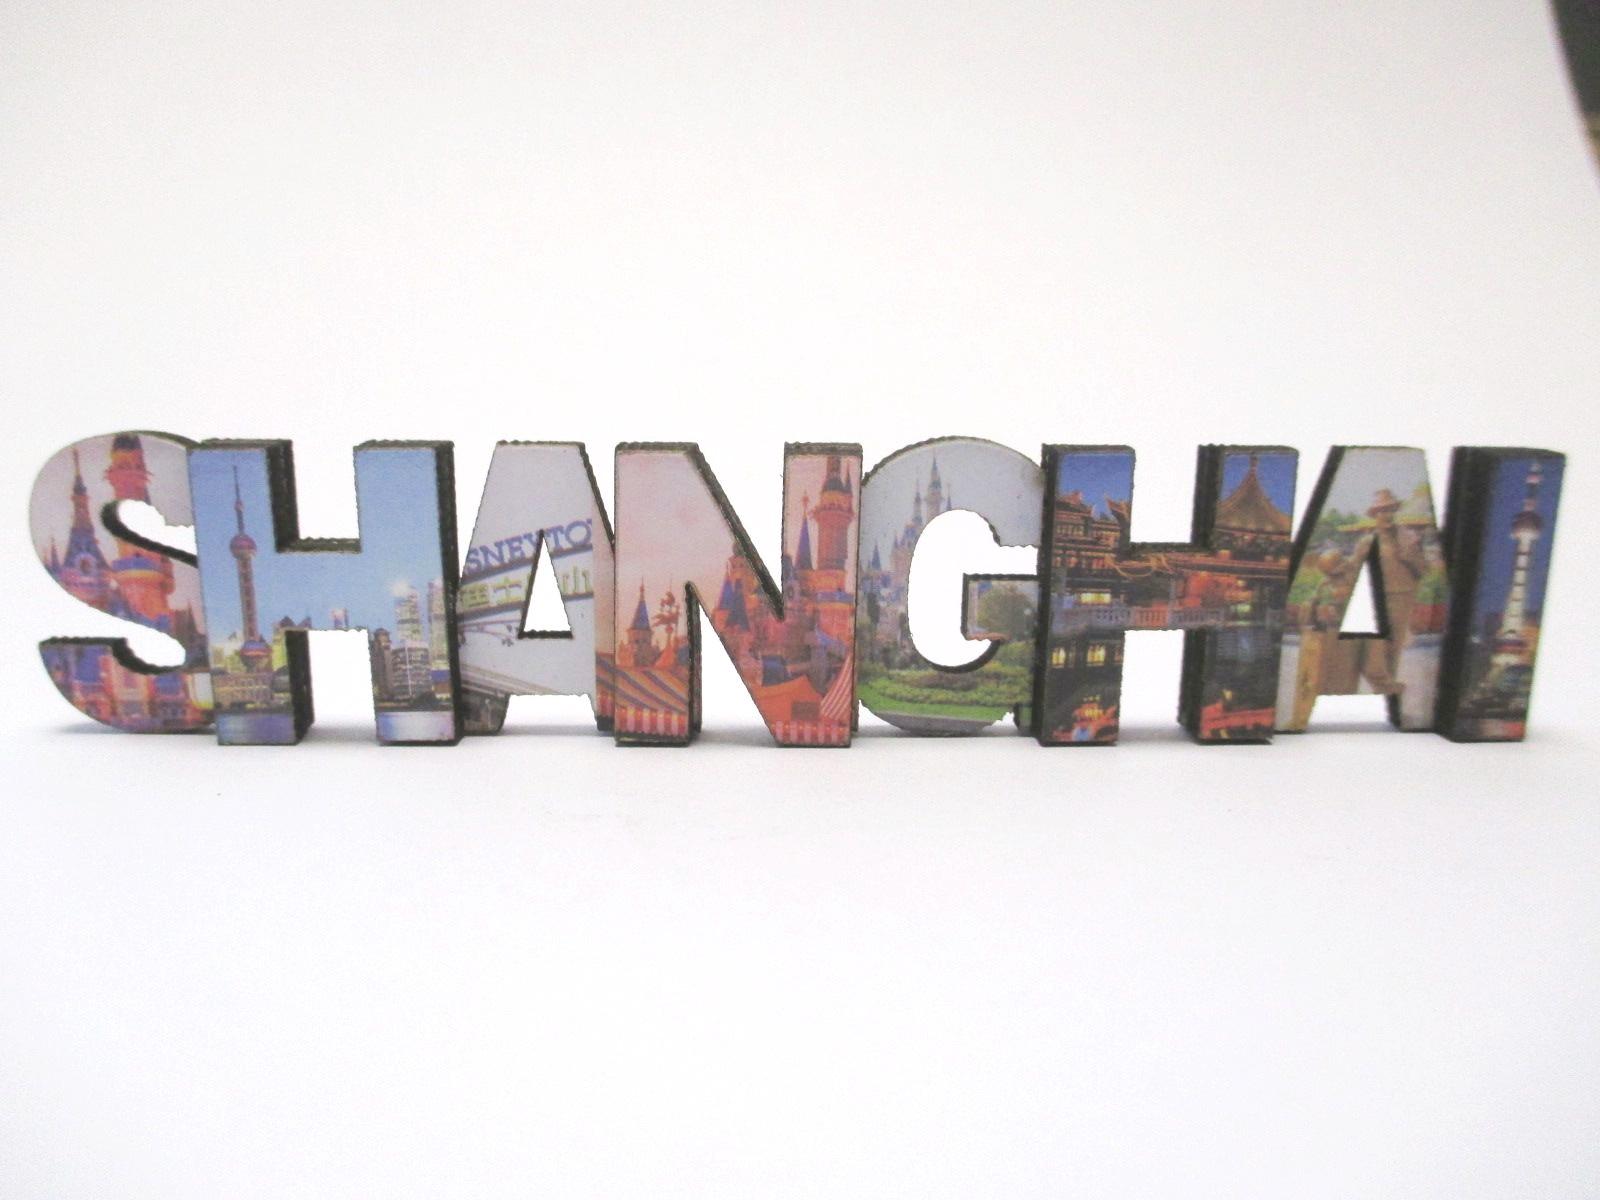 Shanghai Wooden Magnet Uppercase Letters,12,5 cm, Souvenir Asia, NEW ...